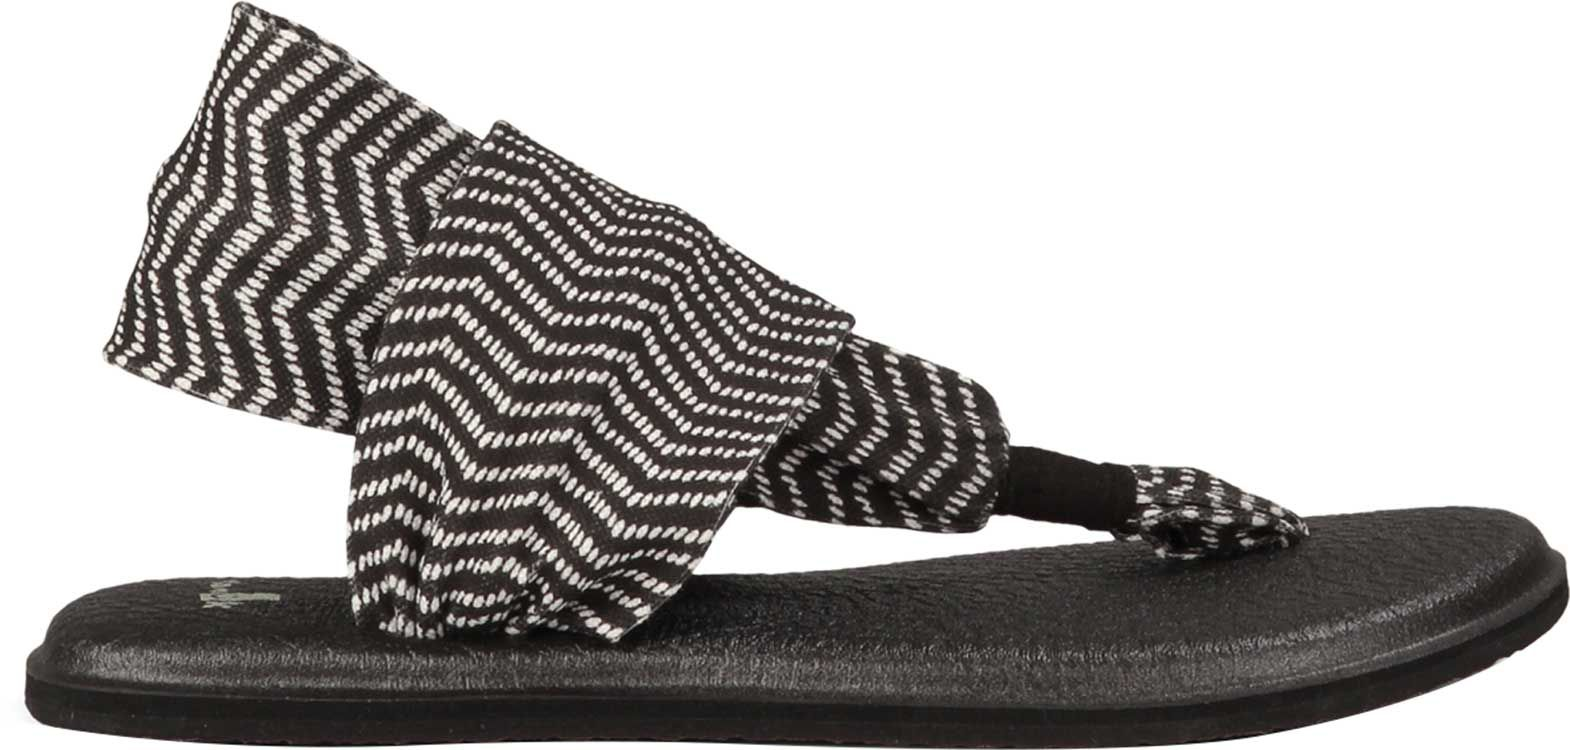 Black enclosed sandals - Product Image Sanuk Women S Yoga Sling 2 Sandals Black Natural Congo